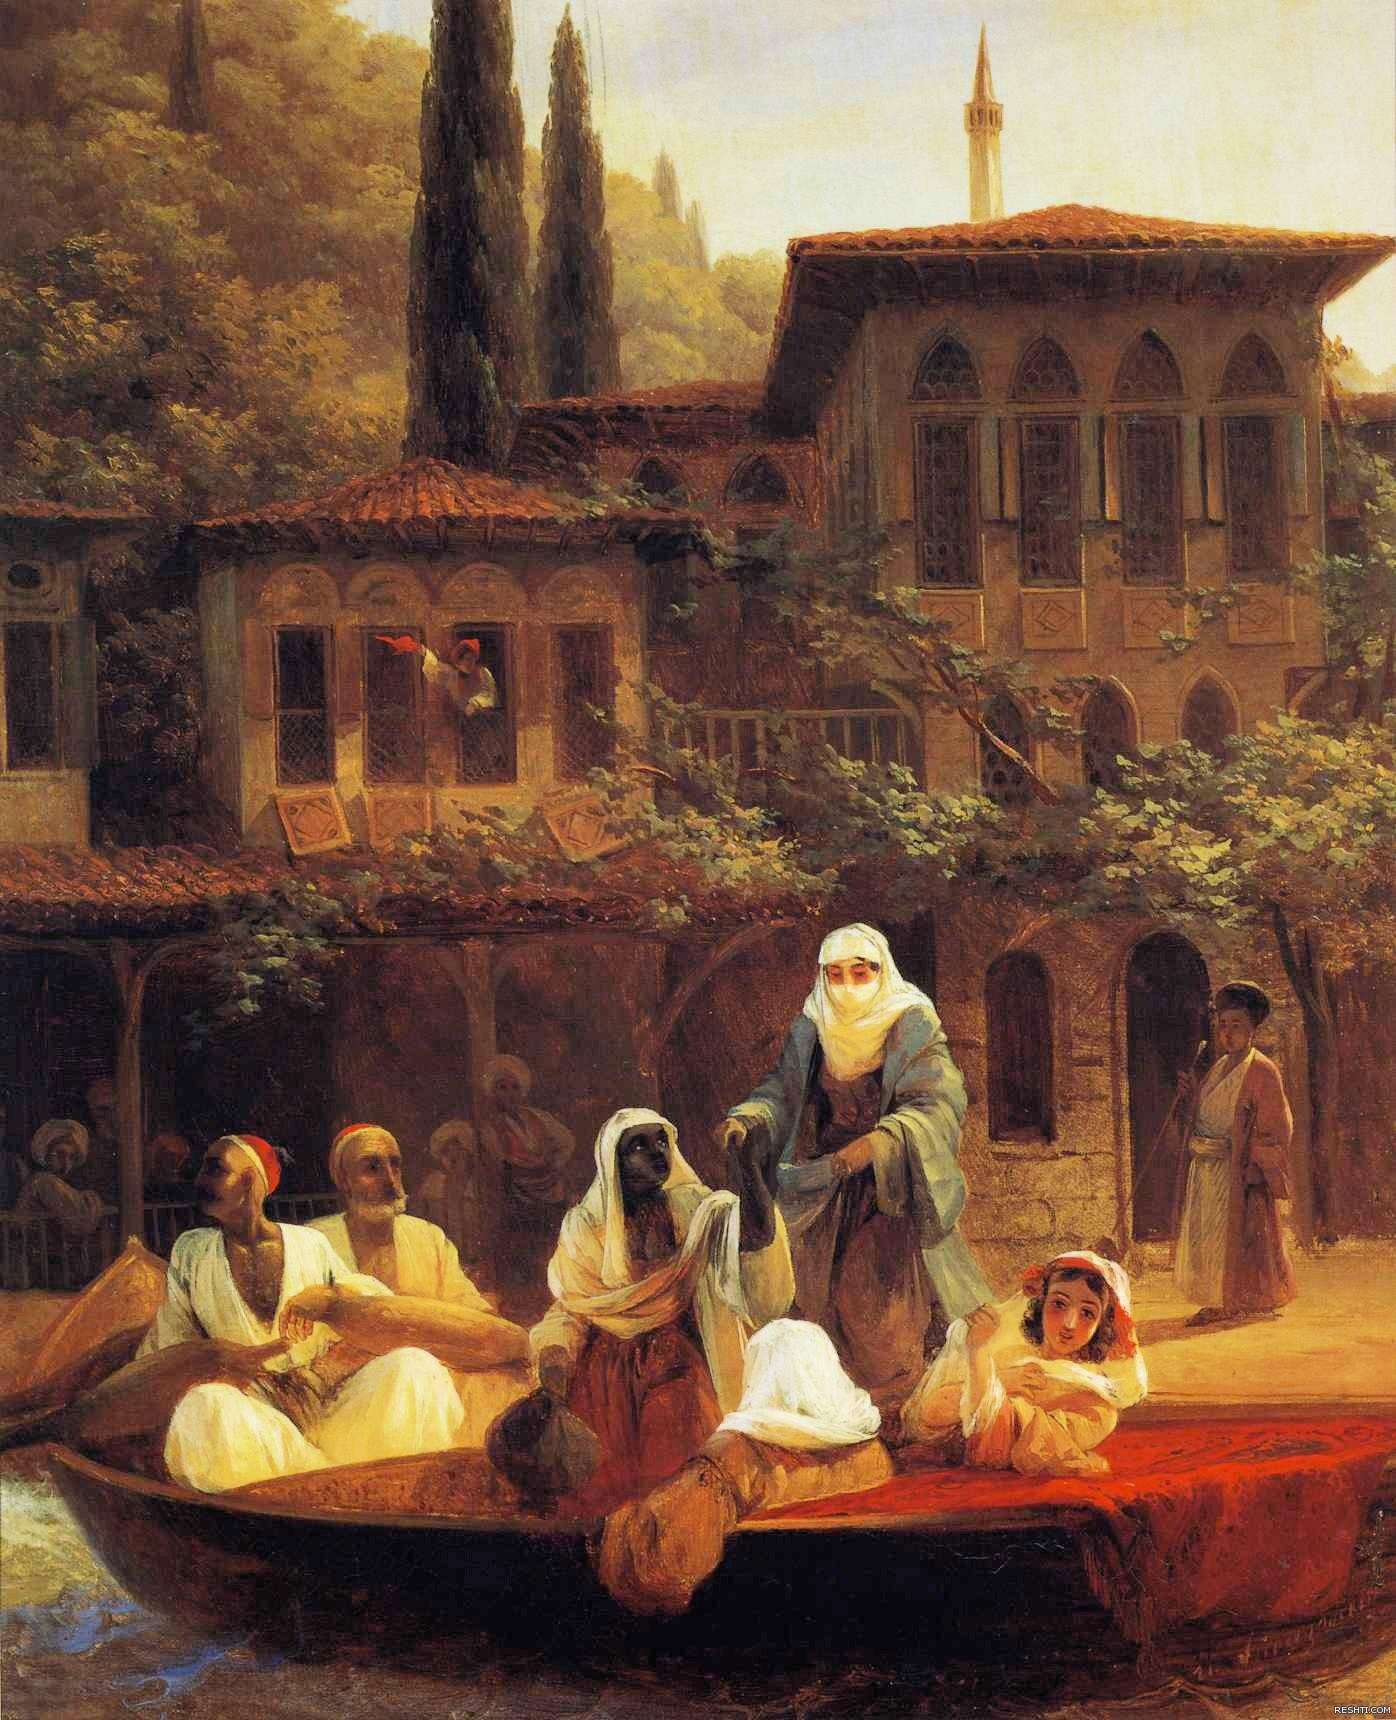 Ivan Aivazovsky (1817-1900)